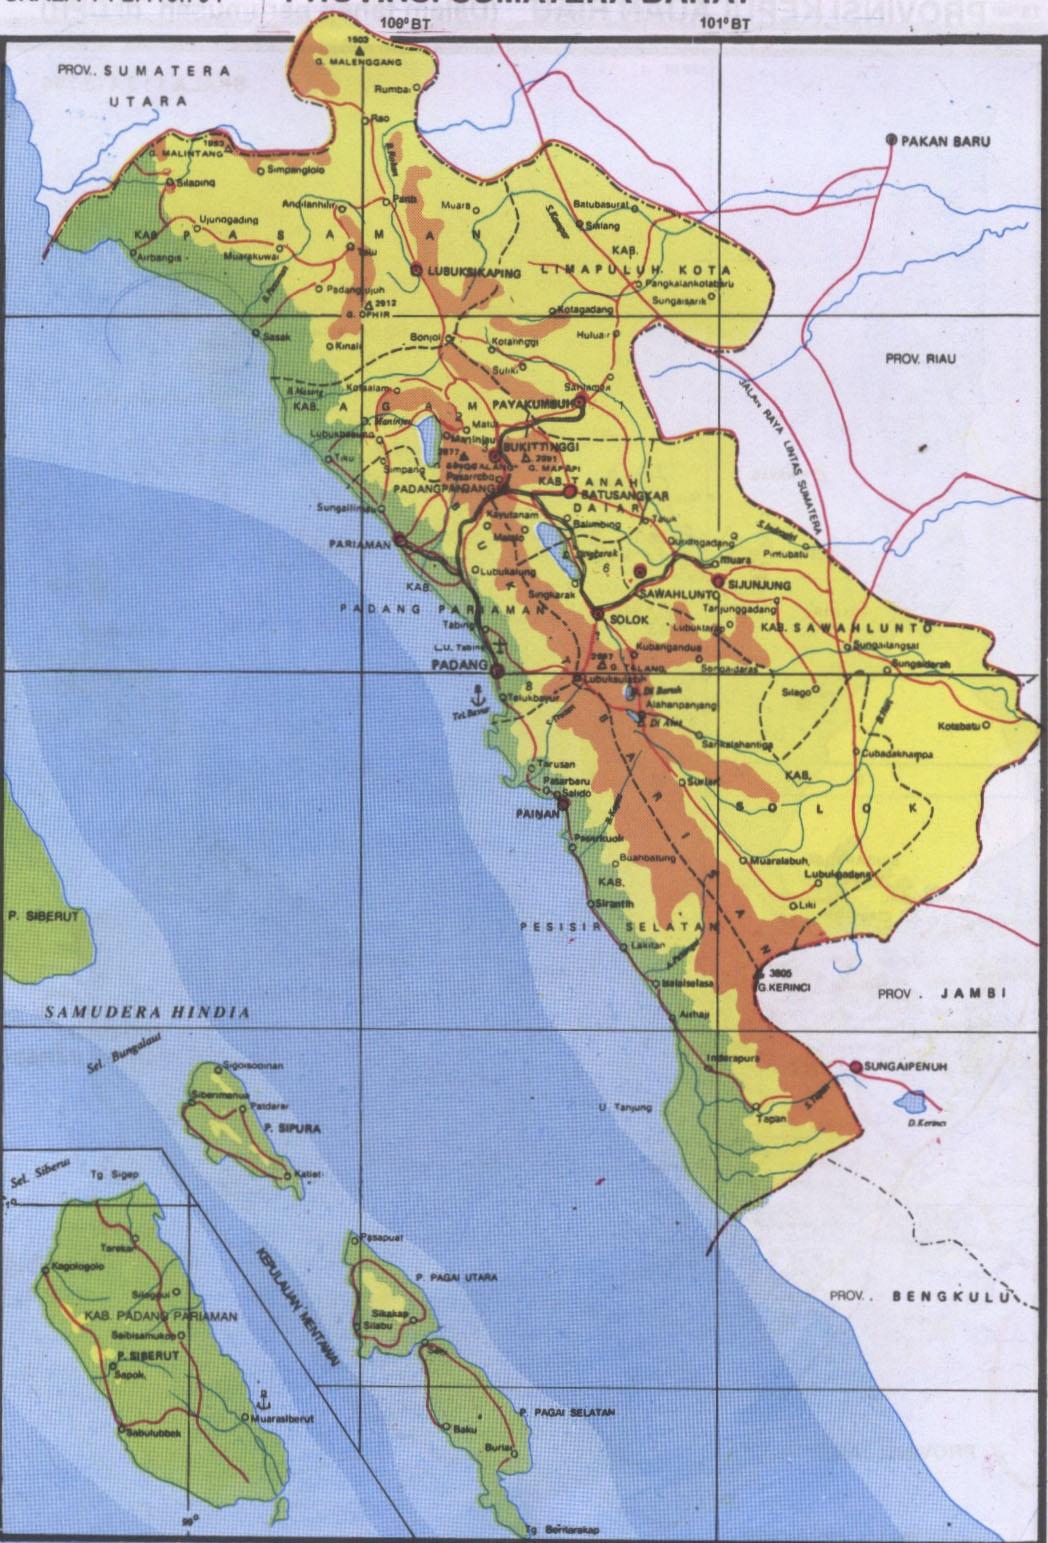 Daftar Nama Tempat Wisata di Sumatera Barat  Yoshiewafa